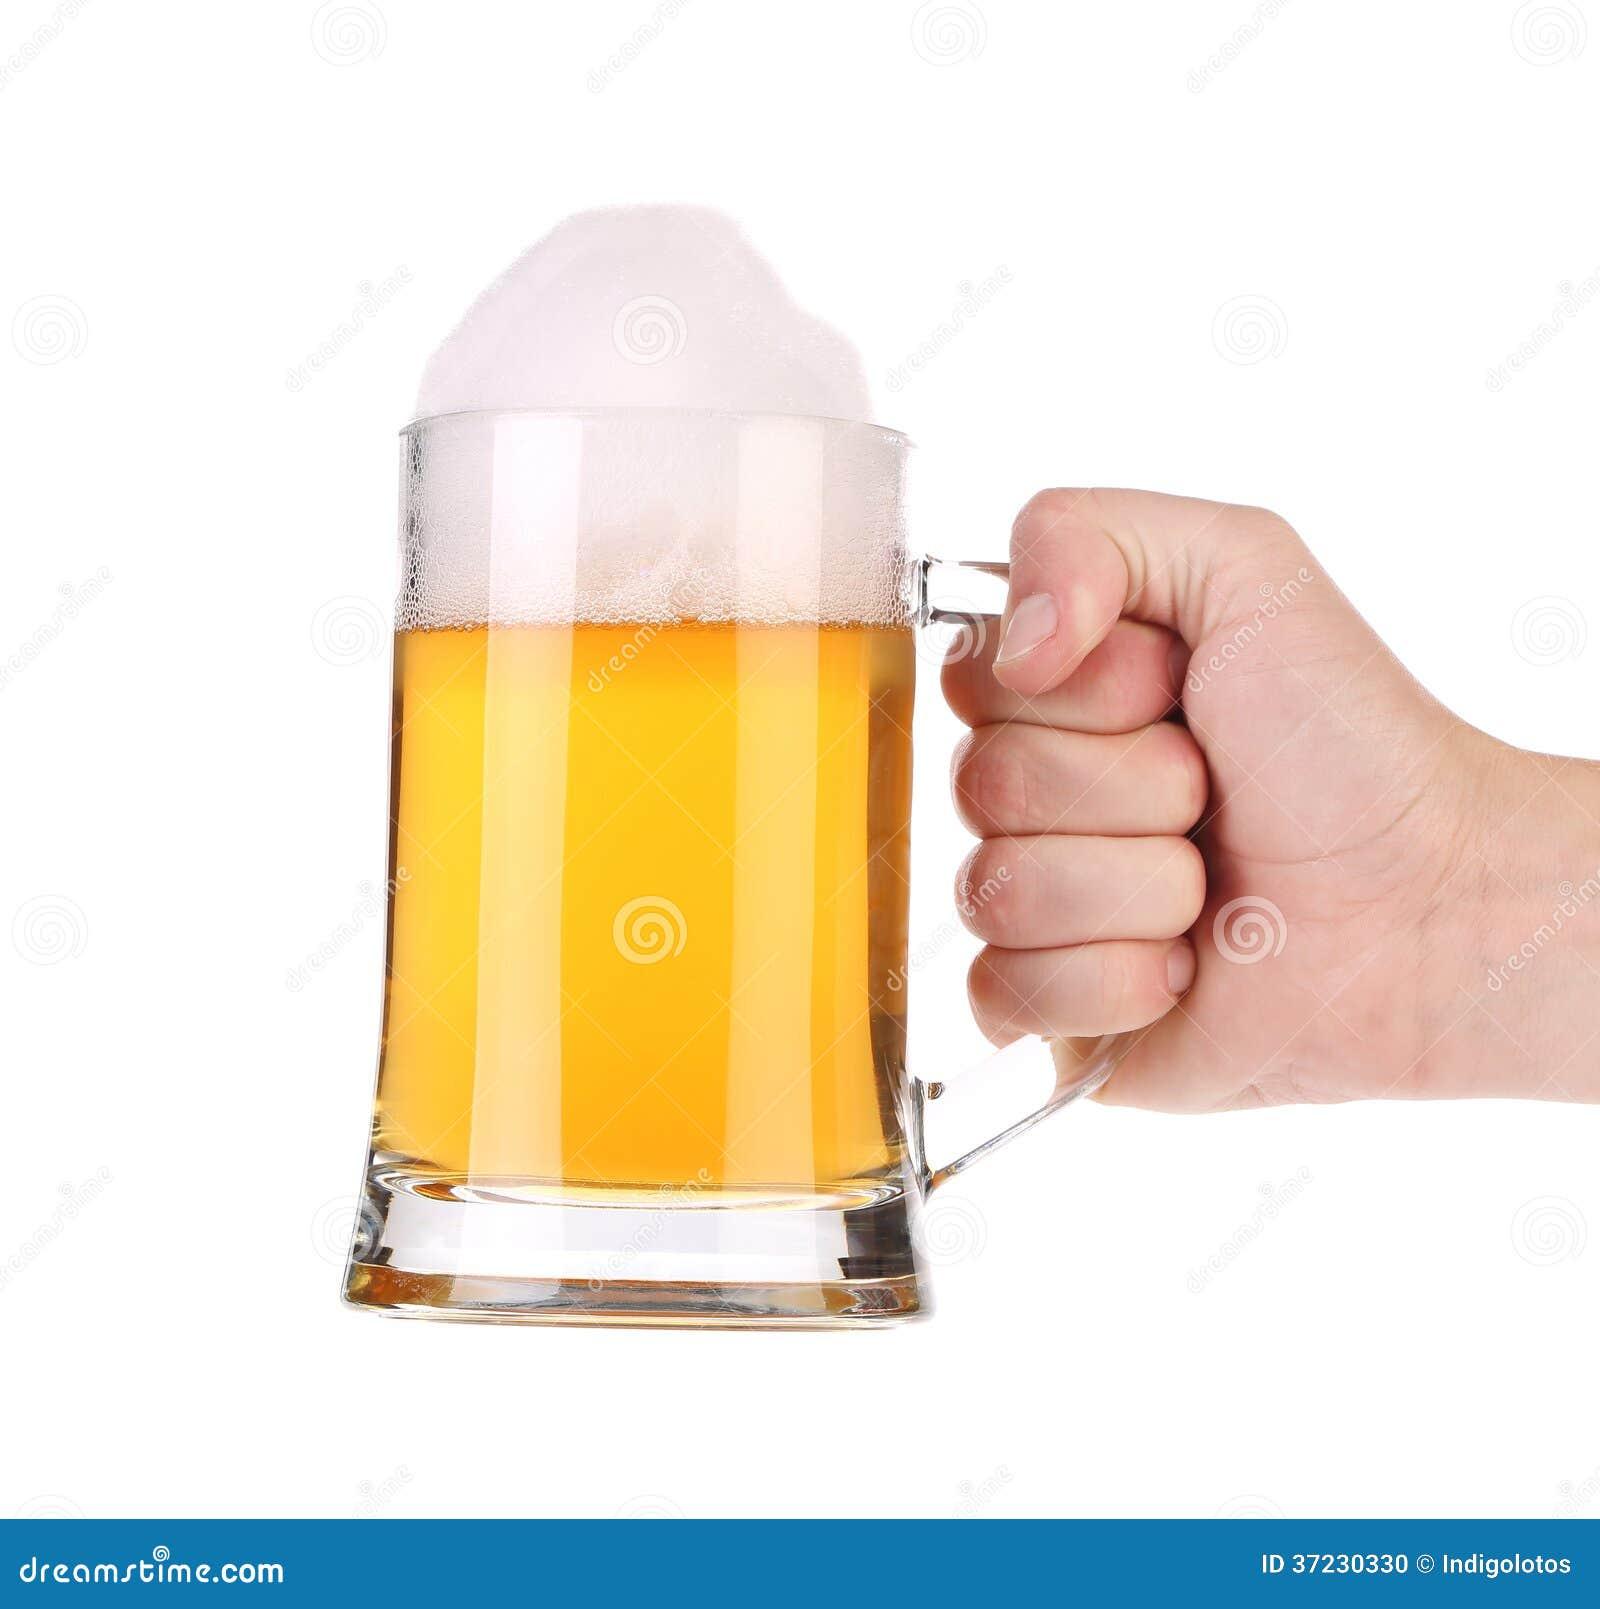 Liquid Gold Alcohol Drink